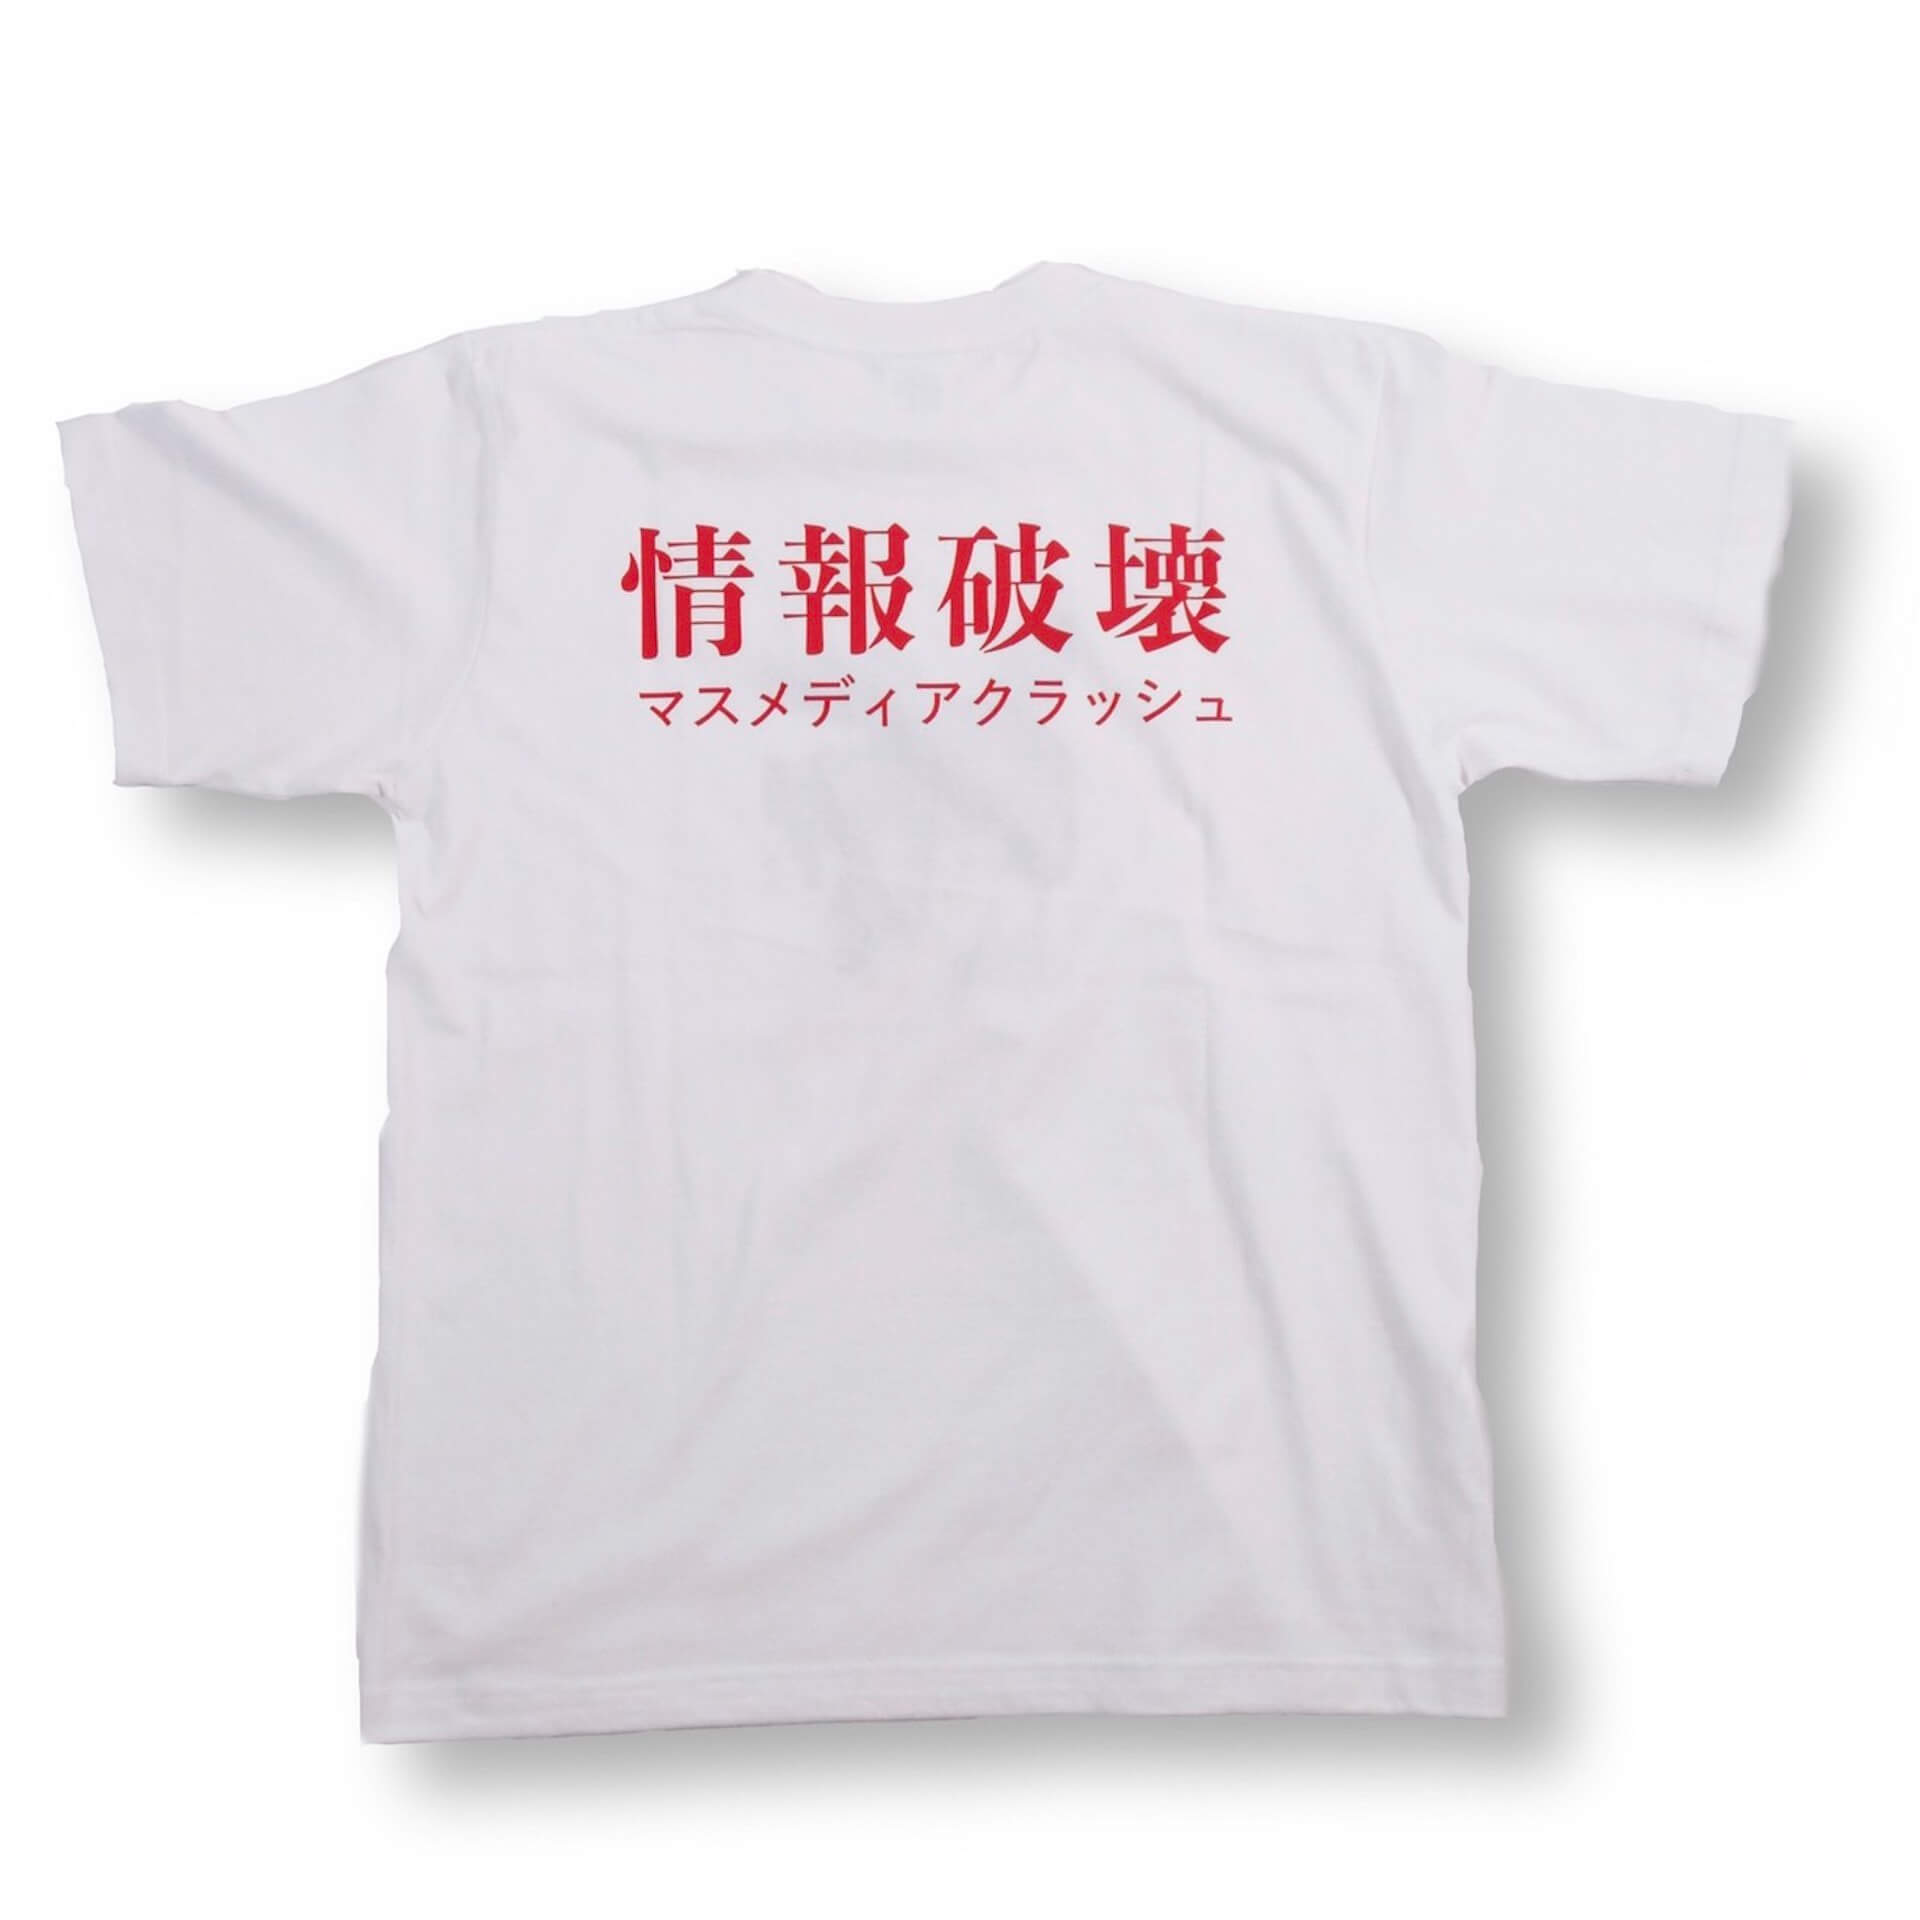 JUN INAGAWA個展『マスメディアクラッシュ』がSHIBUYA TSUTAYAにて開催決定!書籍購入者へのサイン会も fation210609_JUNINAGAWA8